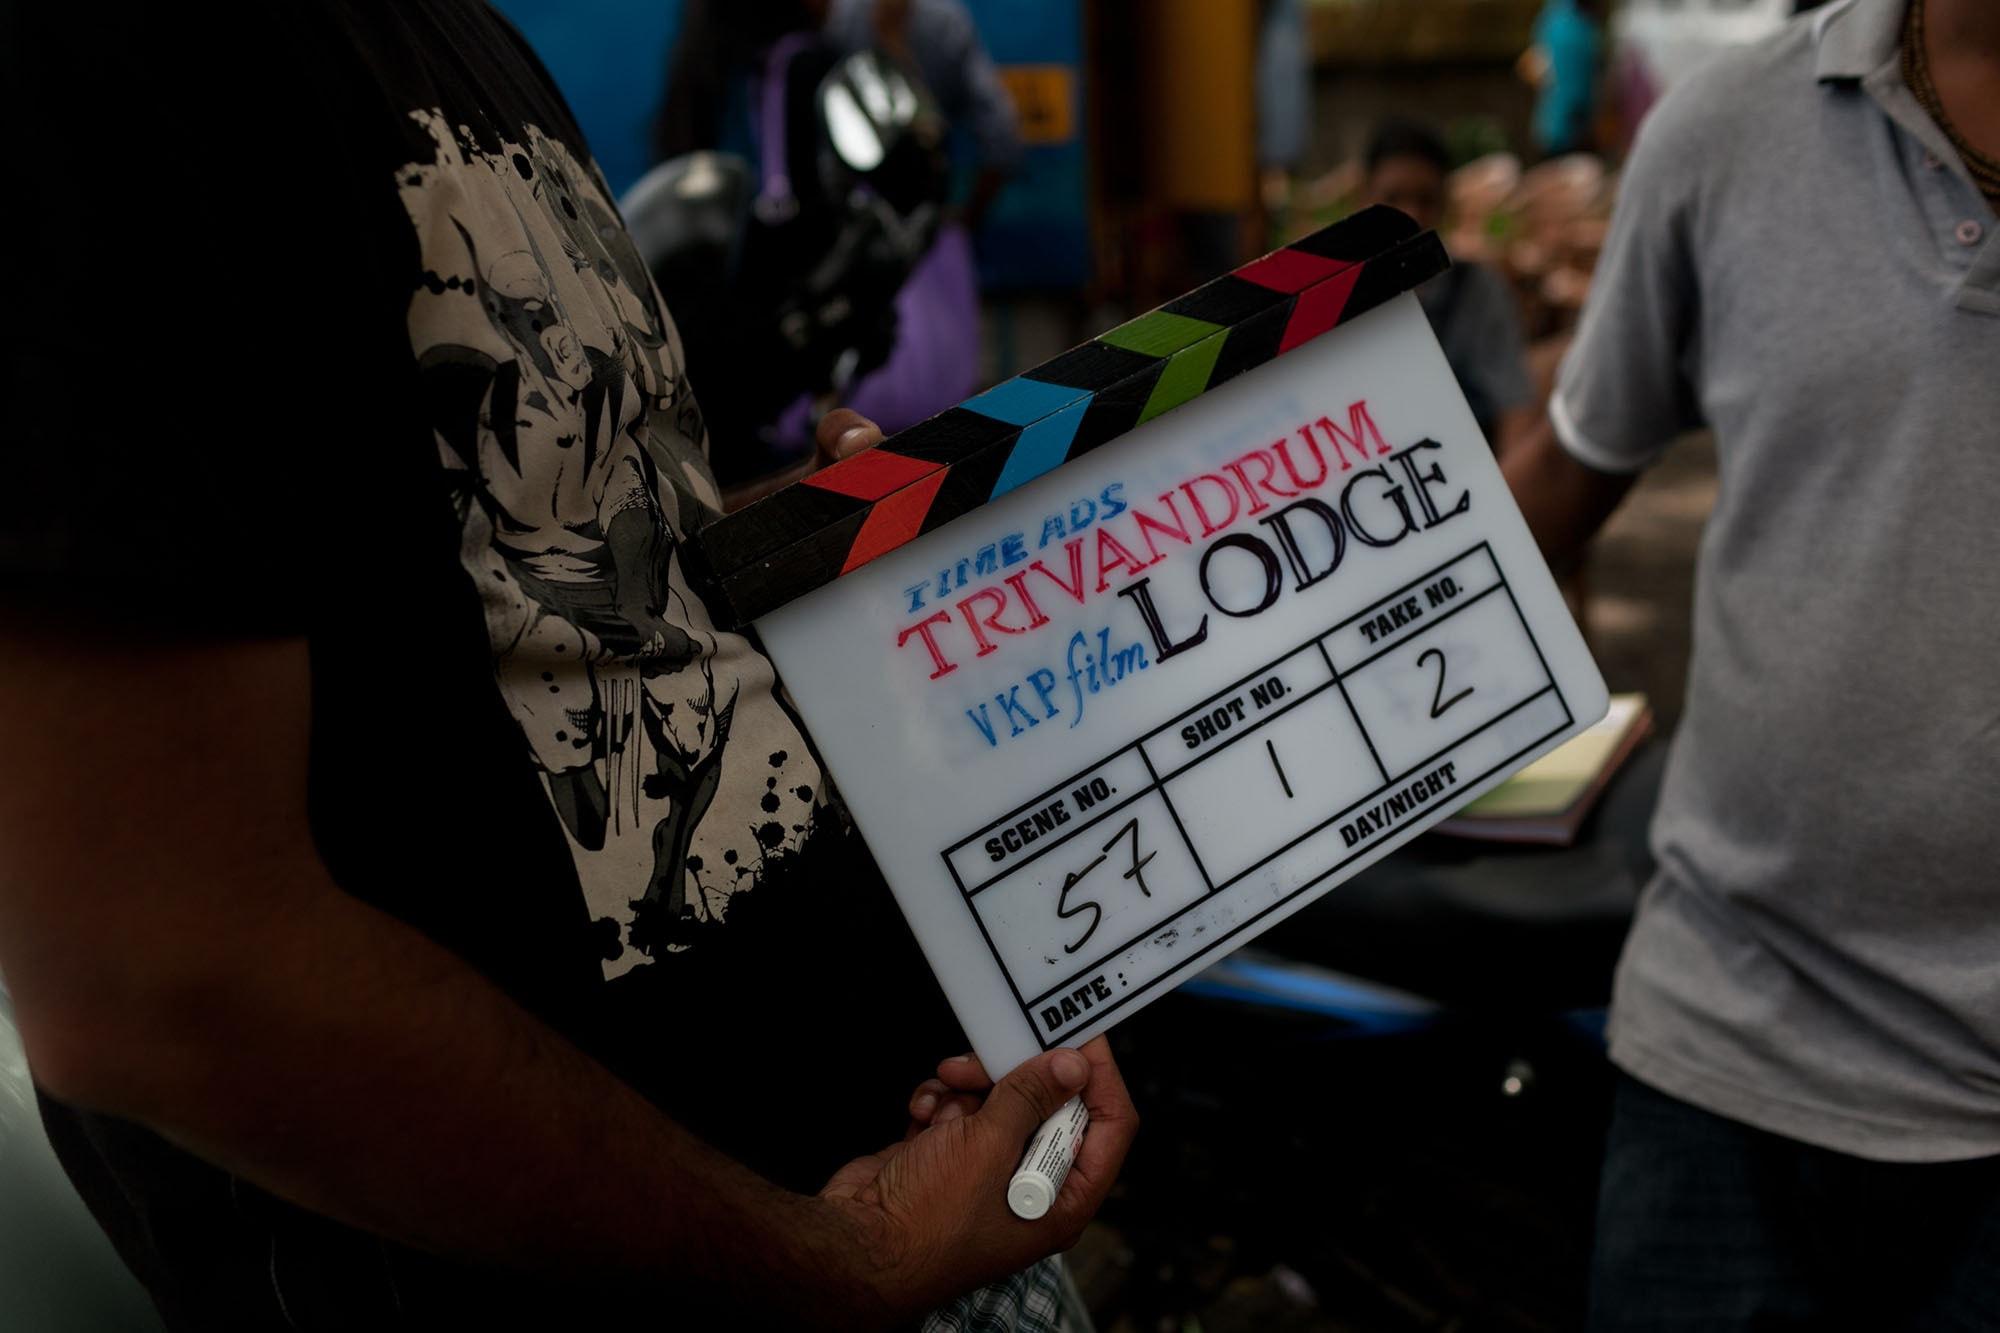 Filming a movie in Kochi, India (Cochin) in Kerala.